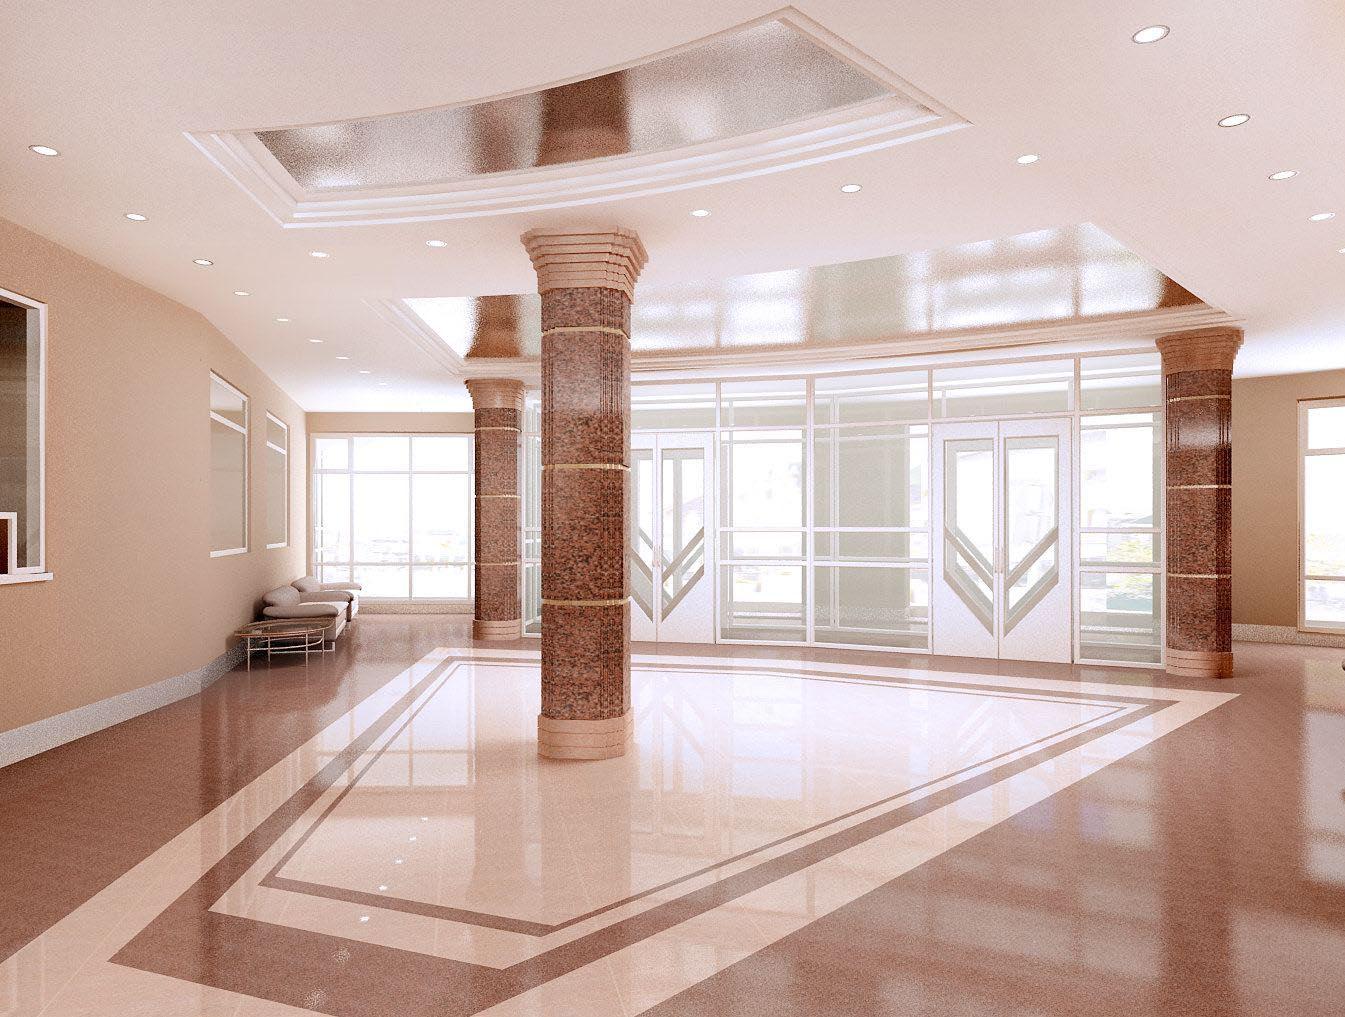 Проект дизайна интерьера холла картинг-центра Форсаж